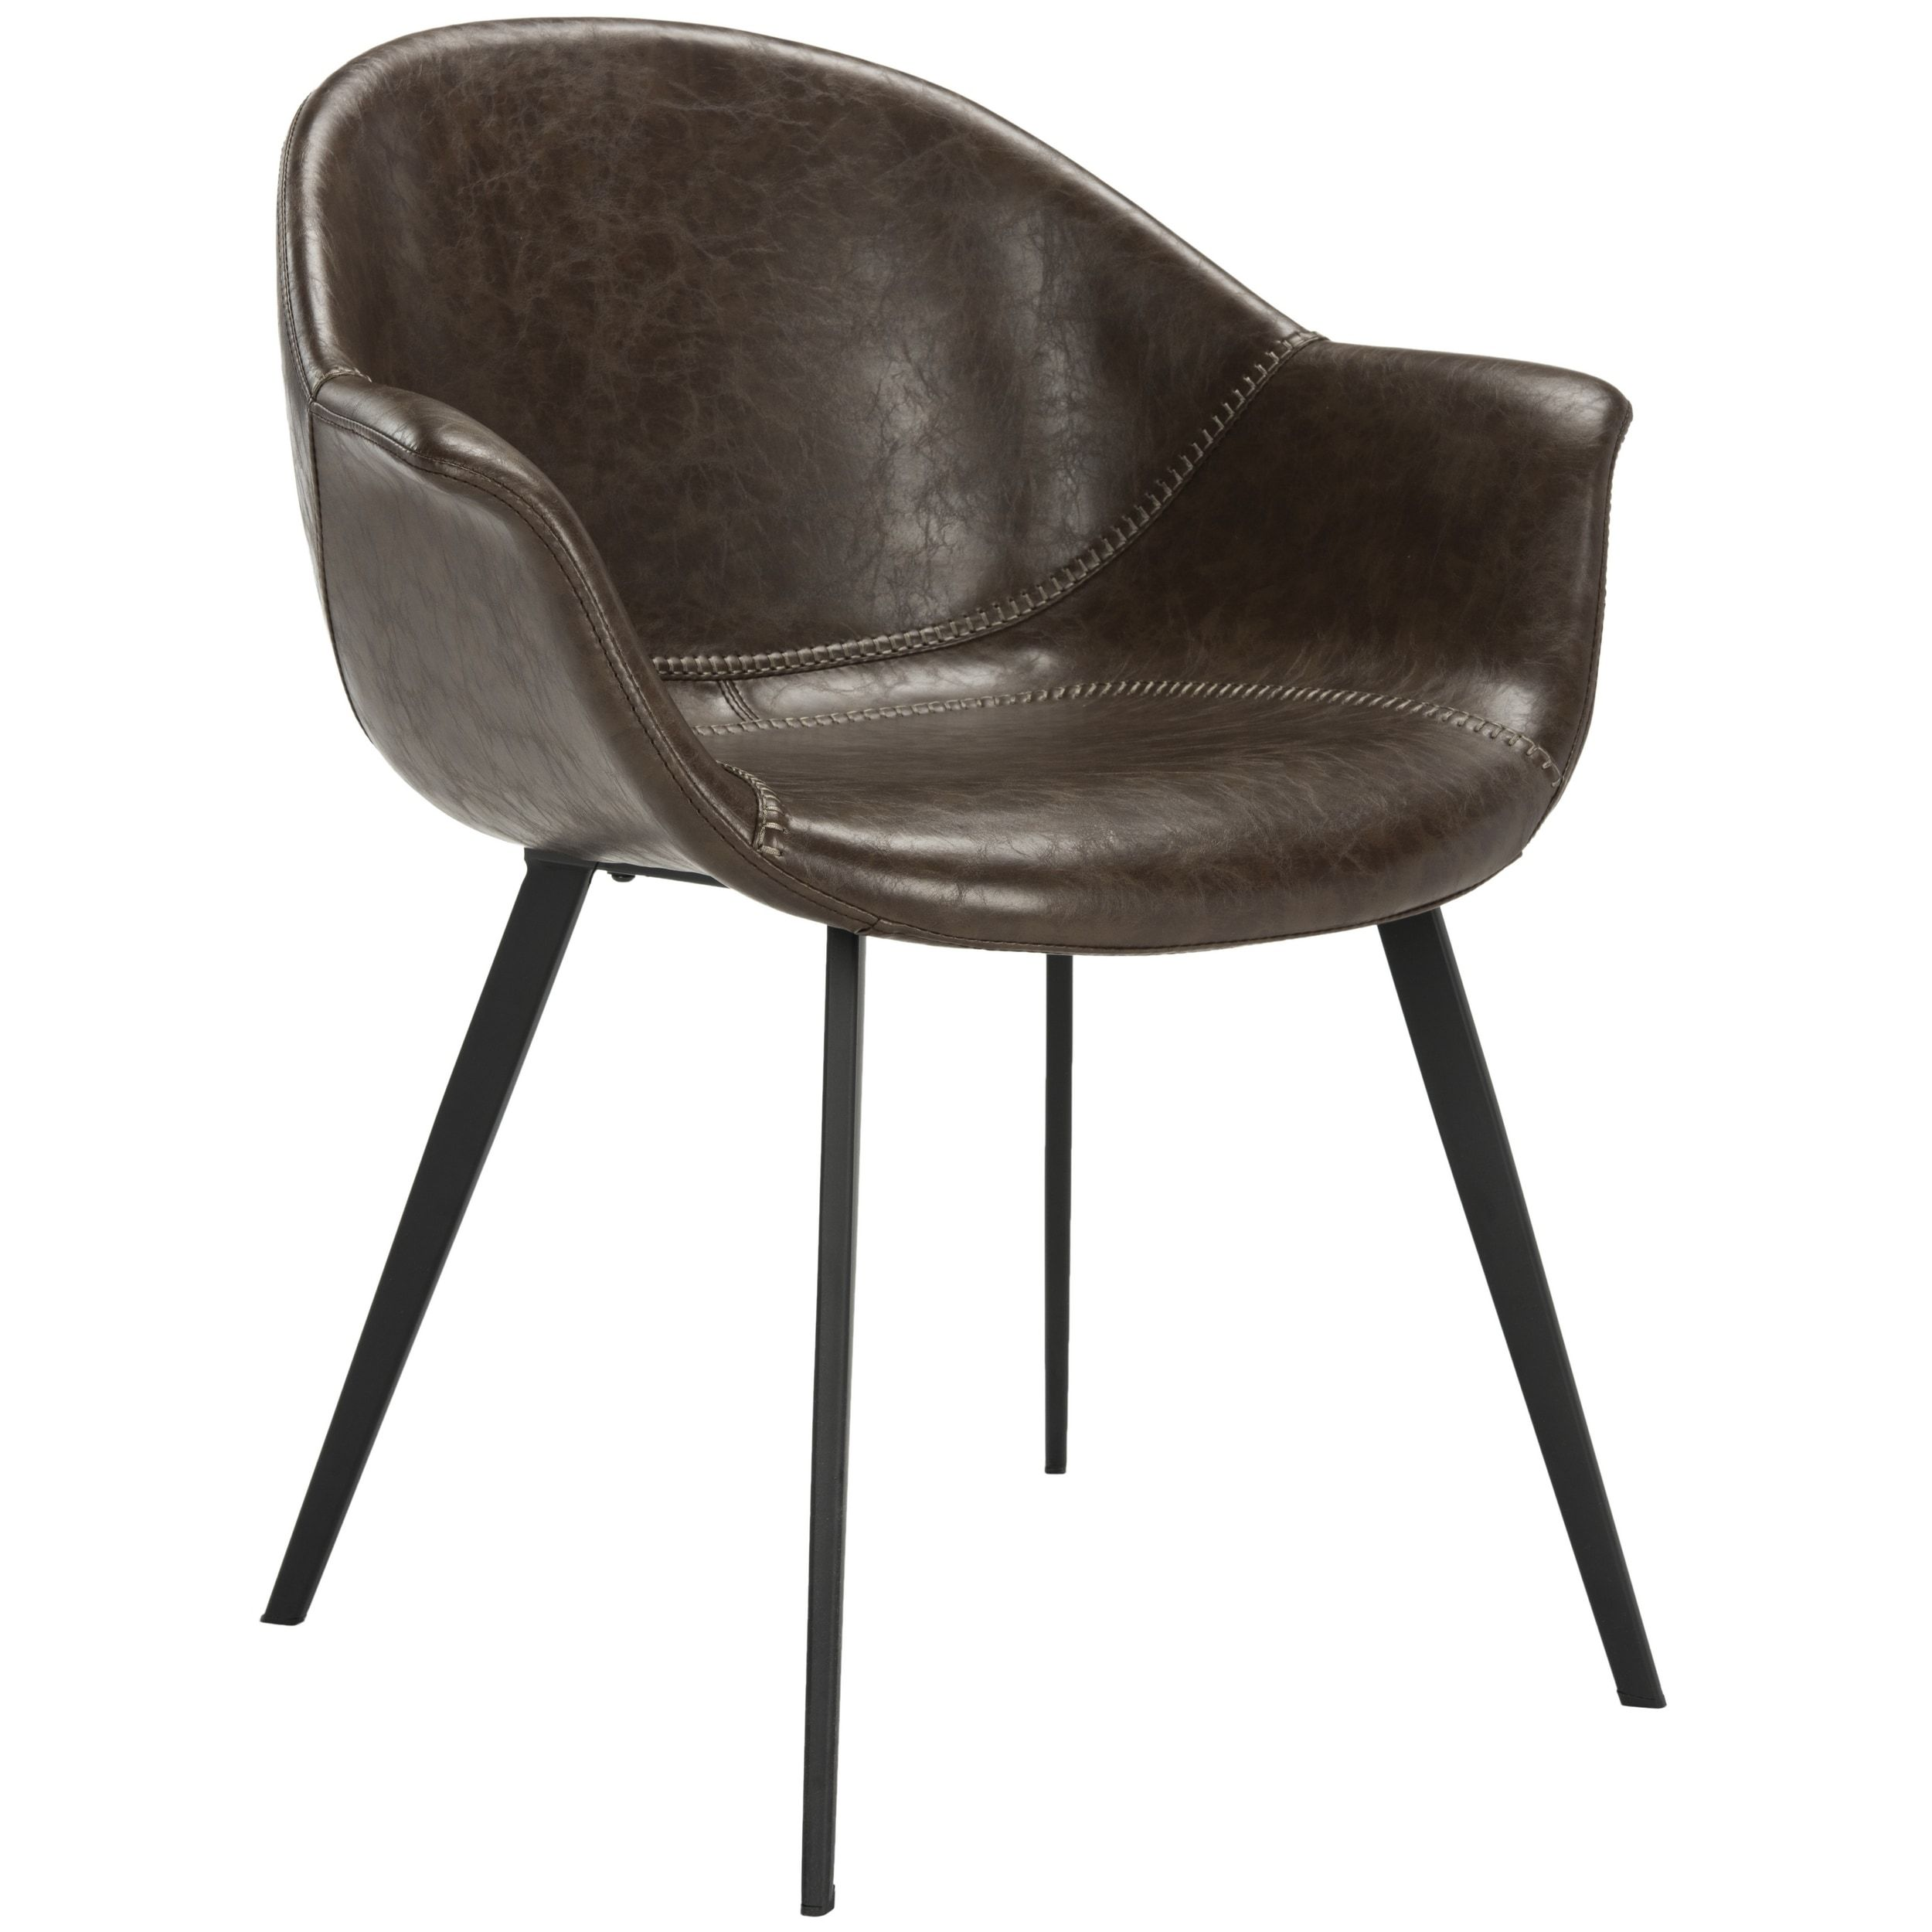 Fantastic Safavieh Dublin Mid Century Modern Leather Dining Tub Creativecarmelina Interior Chair Design Creativecarmelinacom